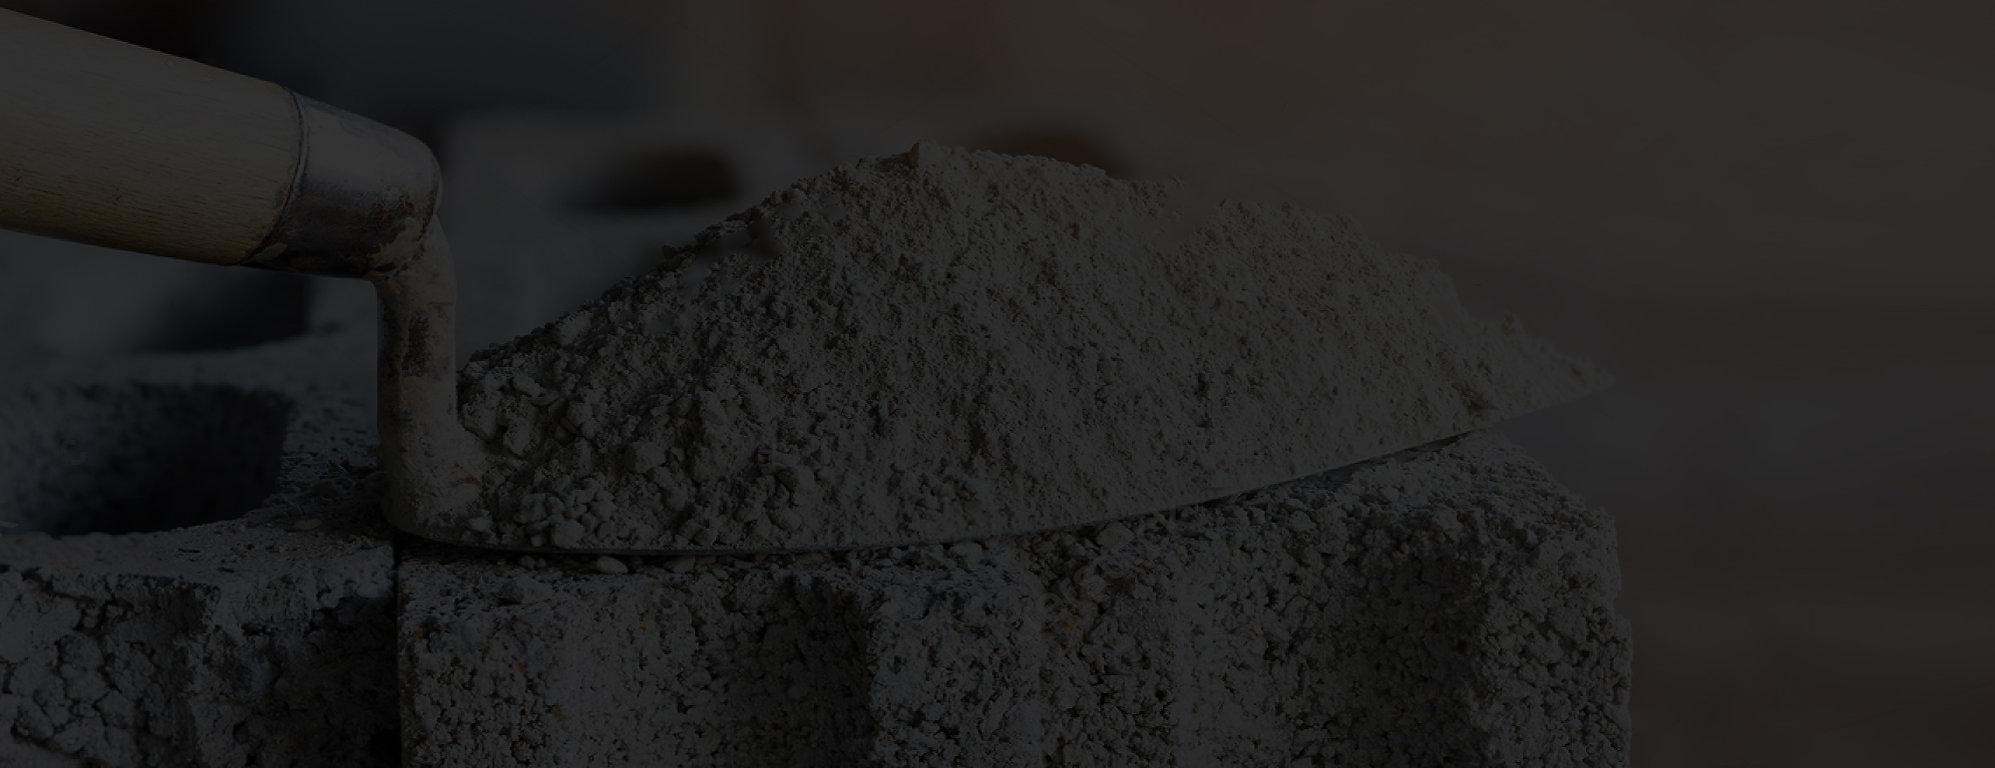 цемент.jpg